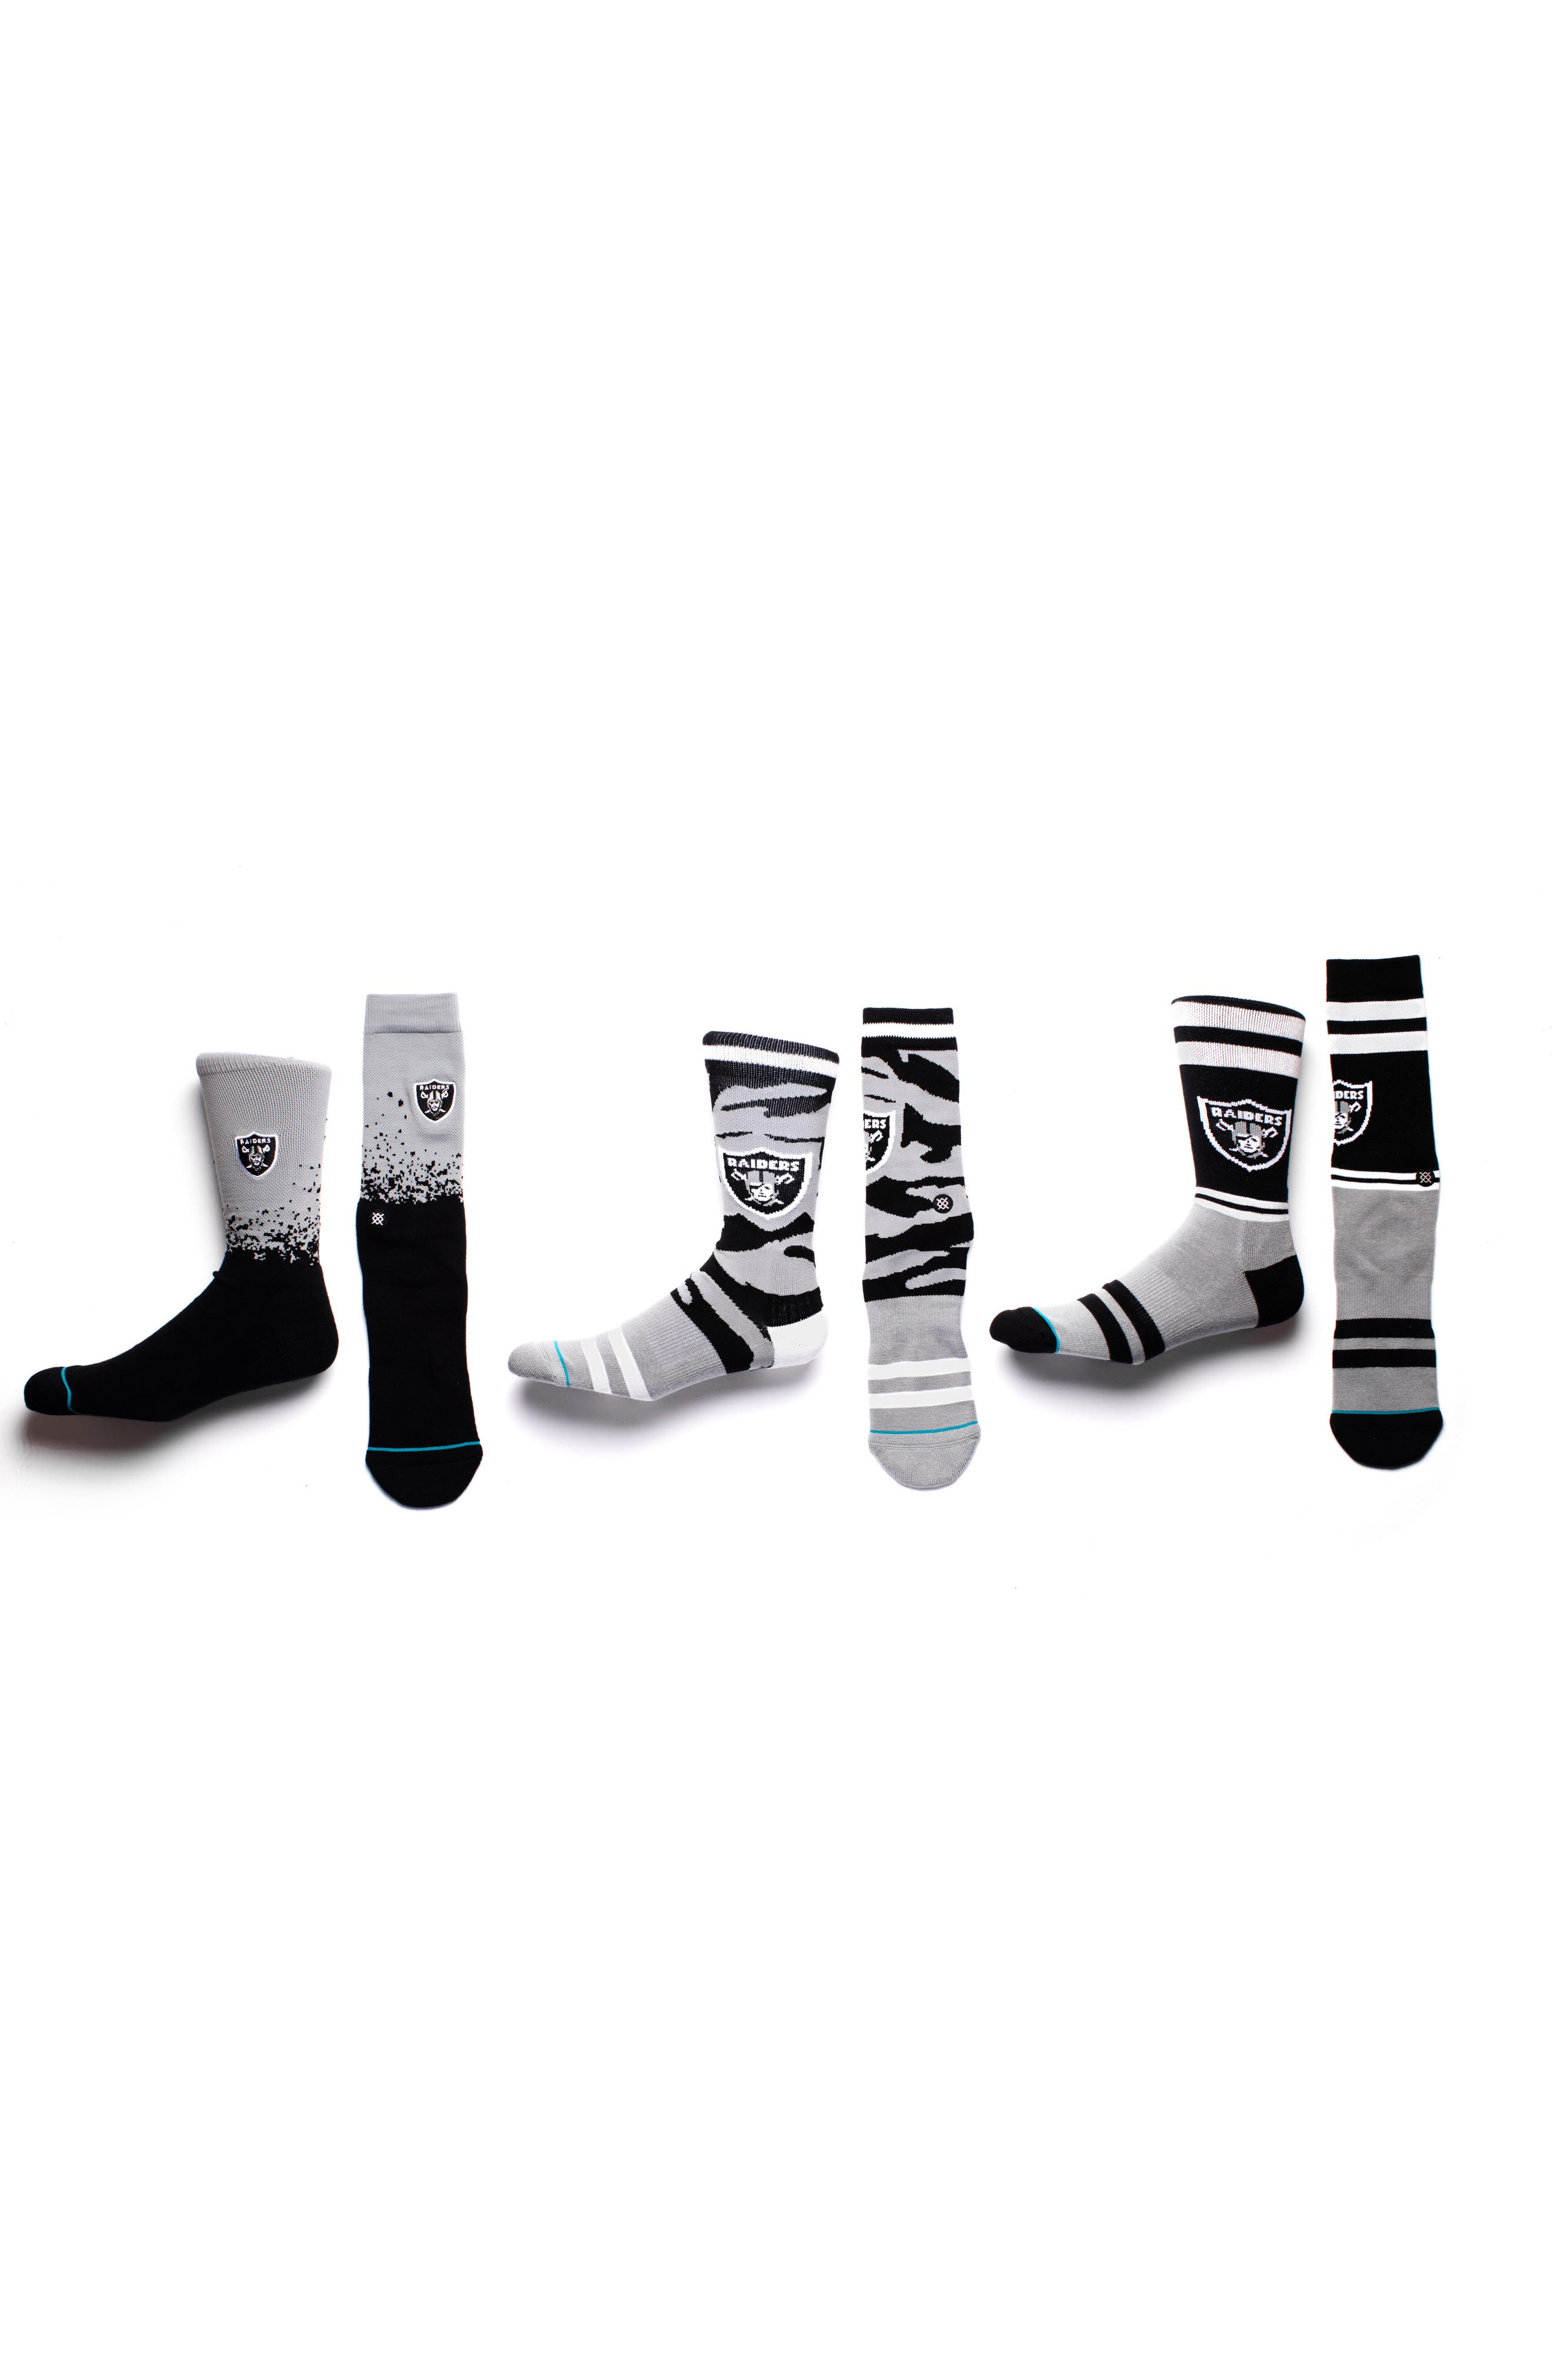 Oakland Raiders Sideline Socks,                             Alternate thumbnail 6, color,                             001